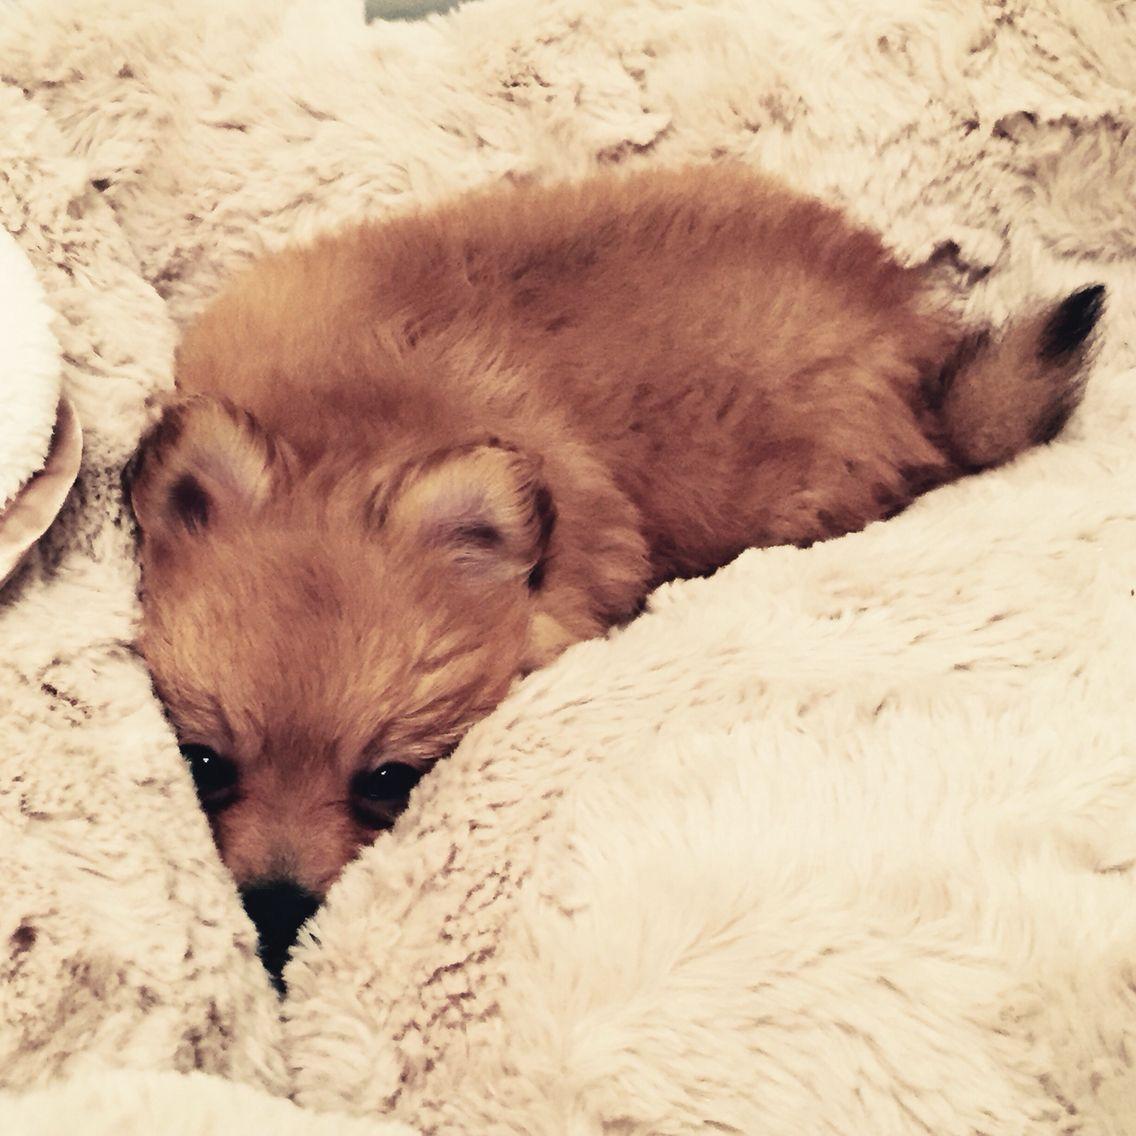 Sleepy Hugo #hugsfromhugo